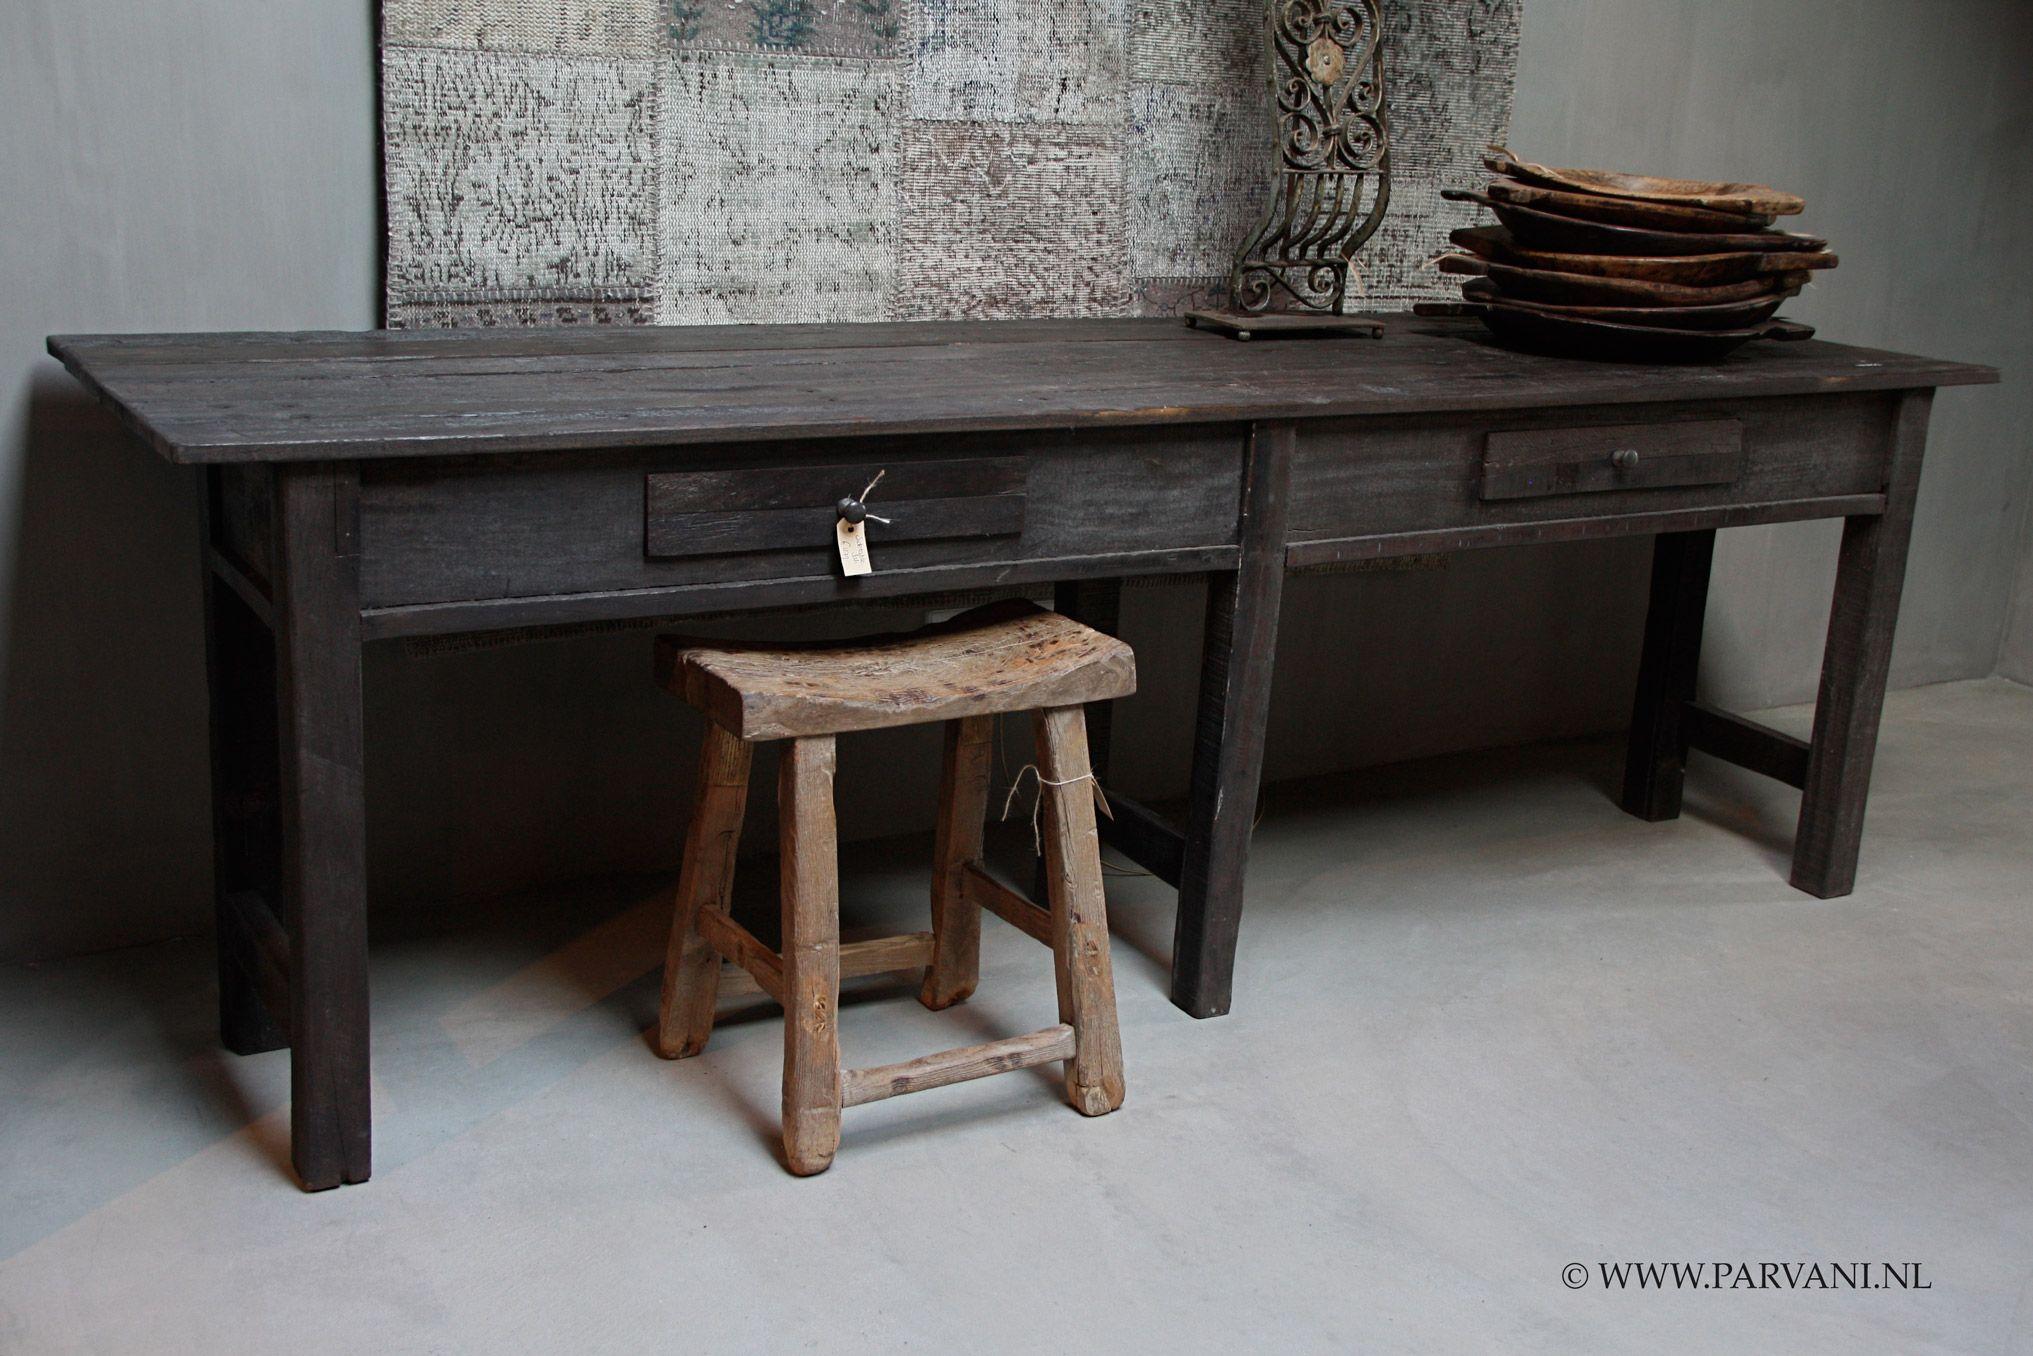 Side Table Donker Hout.Parvani Sidetable Sali Hoffz Hout Stoer Robuust Donker Parvani